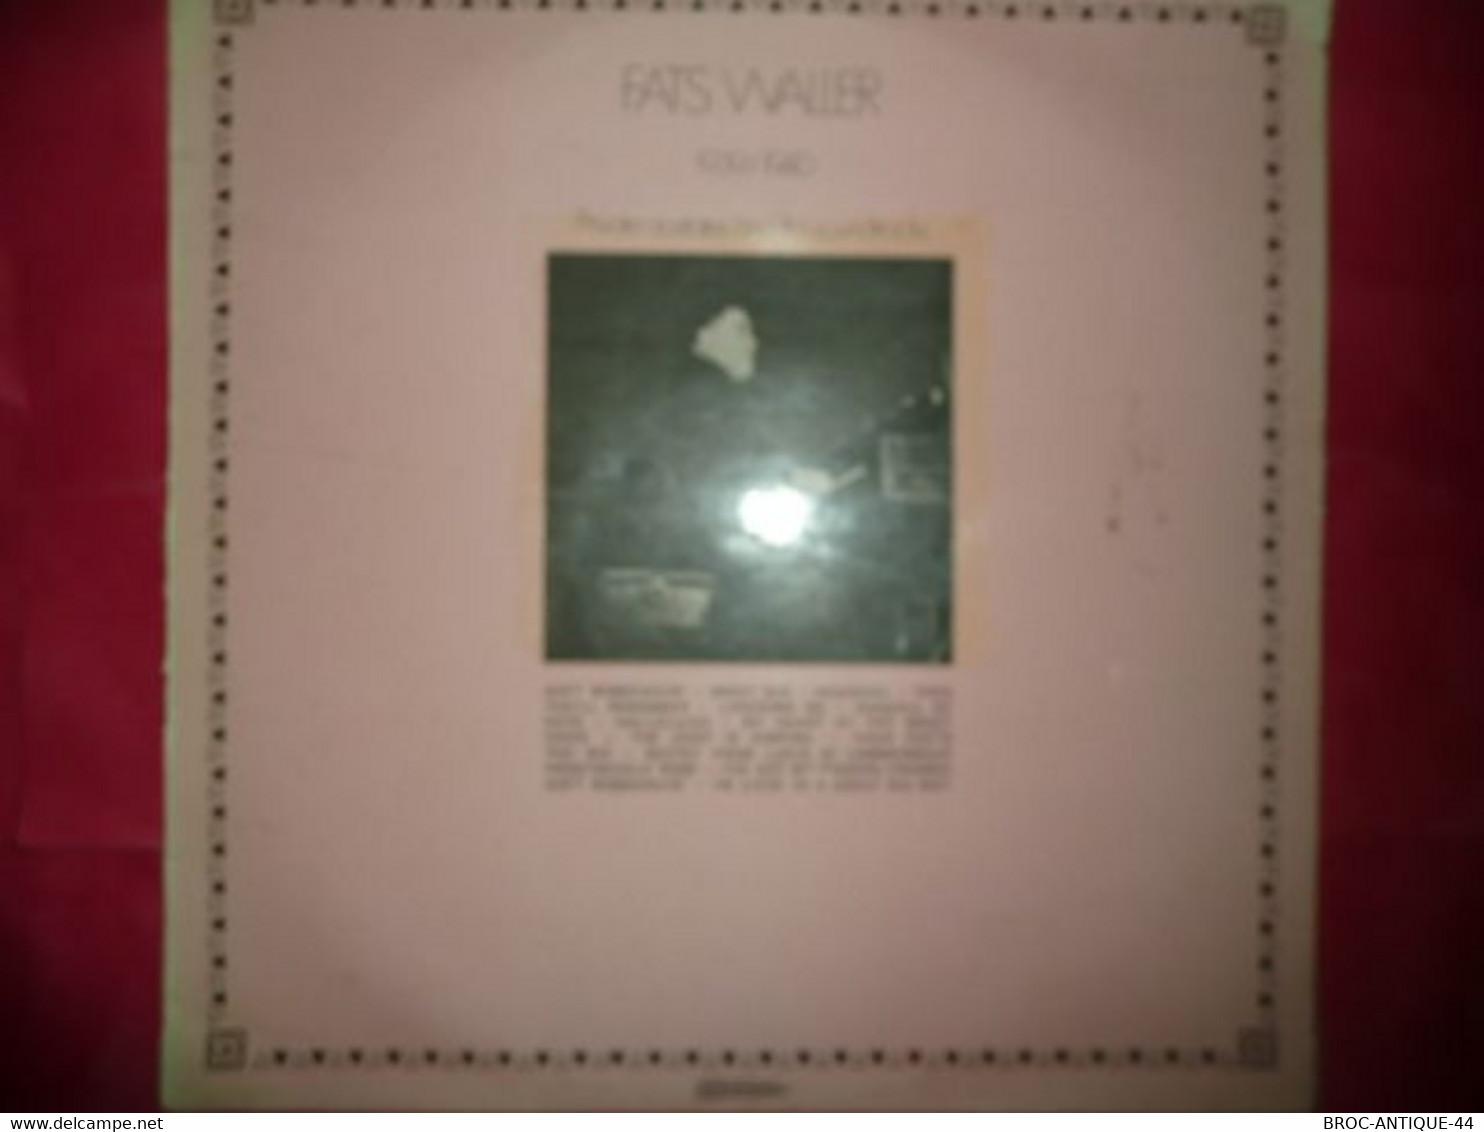 LP33 N°7873 - FATS WALLER - 30 JA 5148 - Jazz